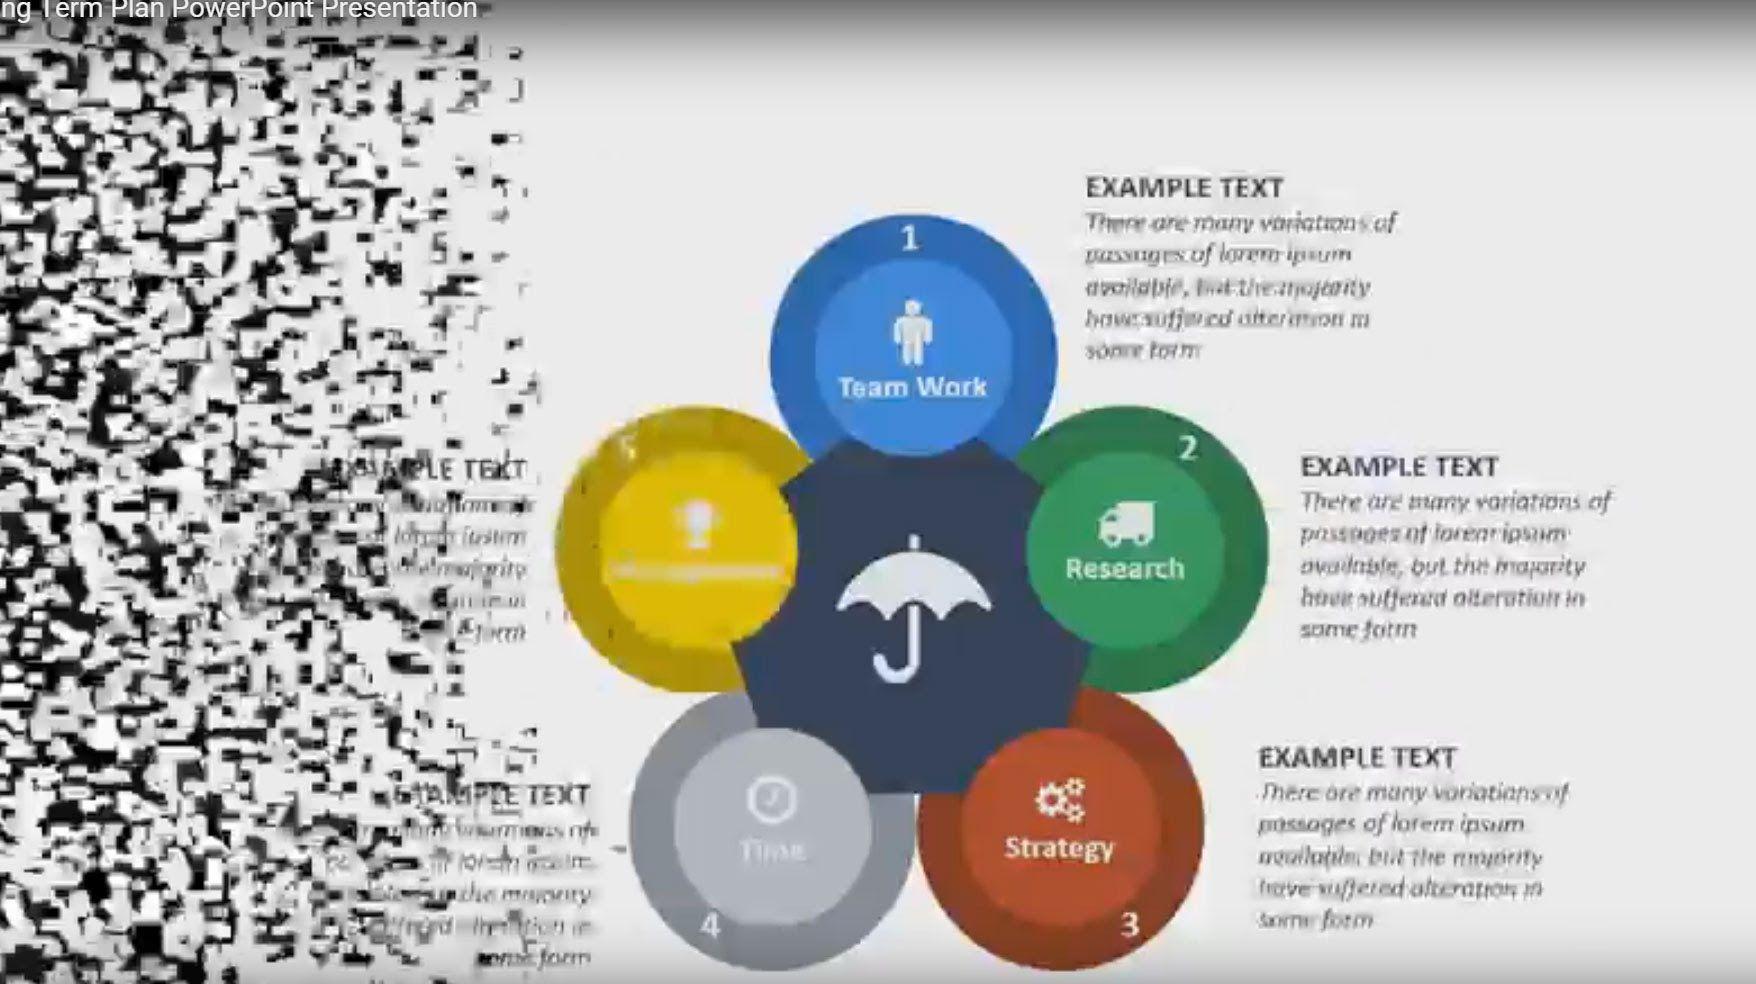 Term Life Insurance PowerPoint Presentation | Presentation